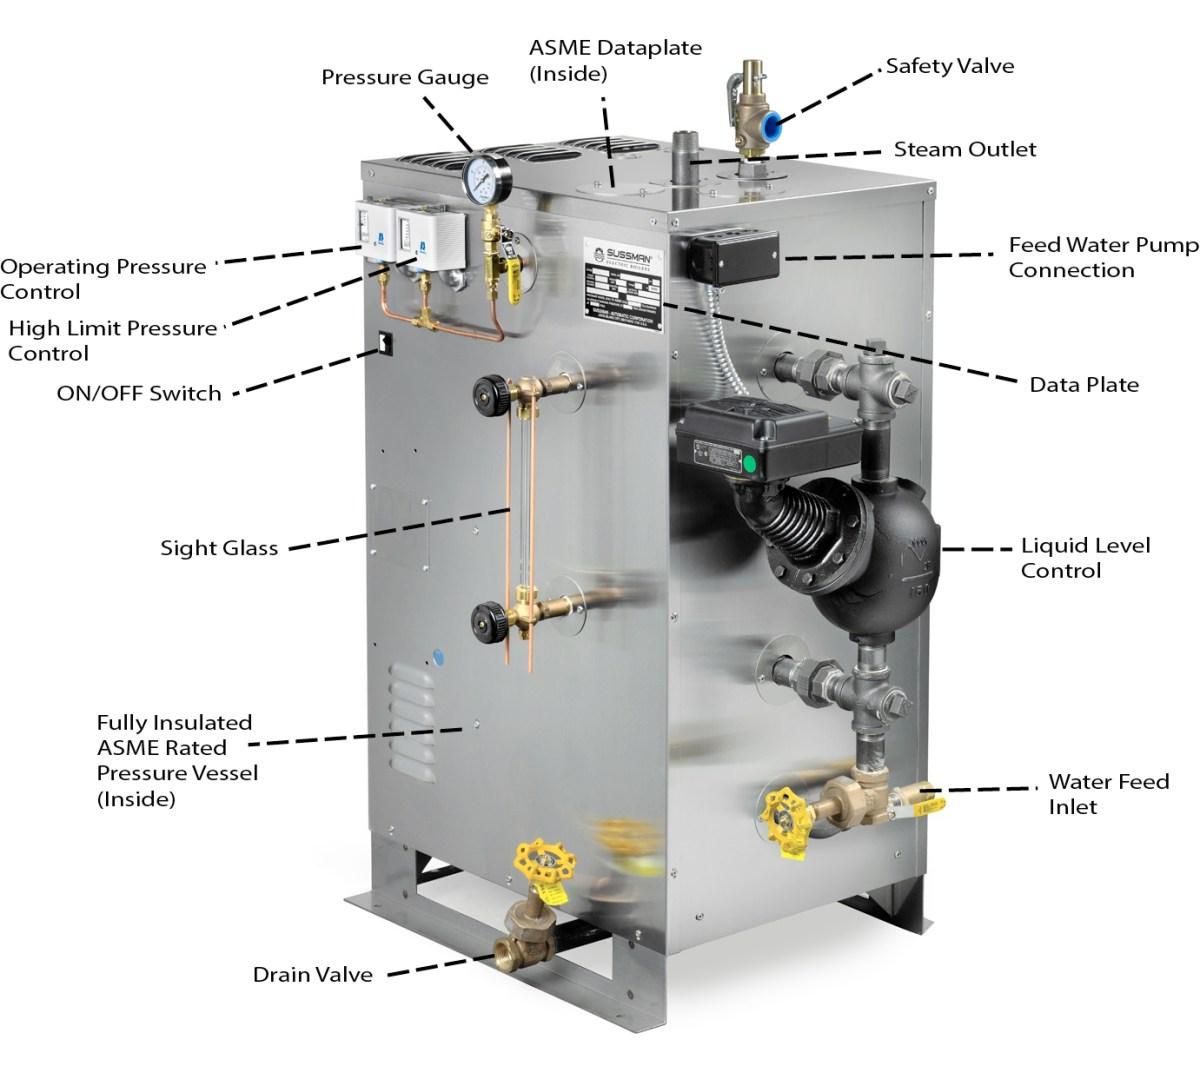 Slantfin Natural Gas Boiler with 150,000 BTU Input 110,000 Output BTU Intermittent Electronic Ignition